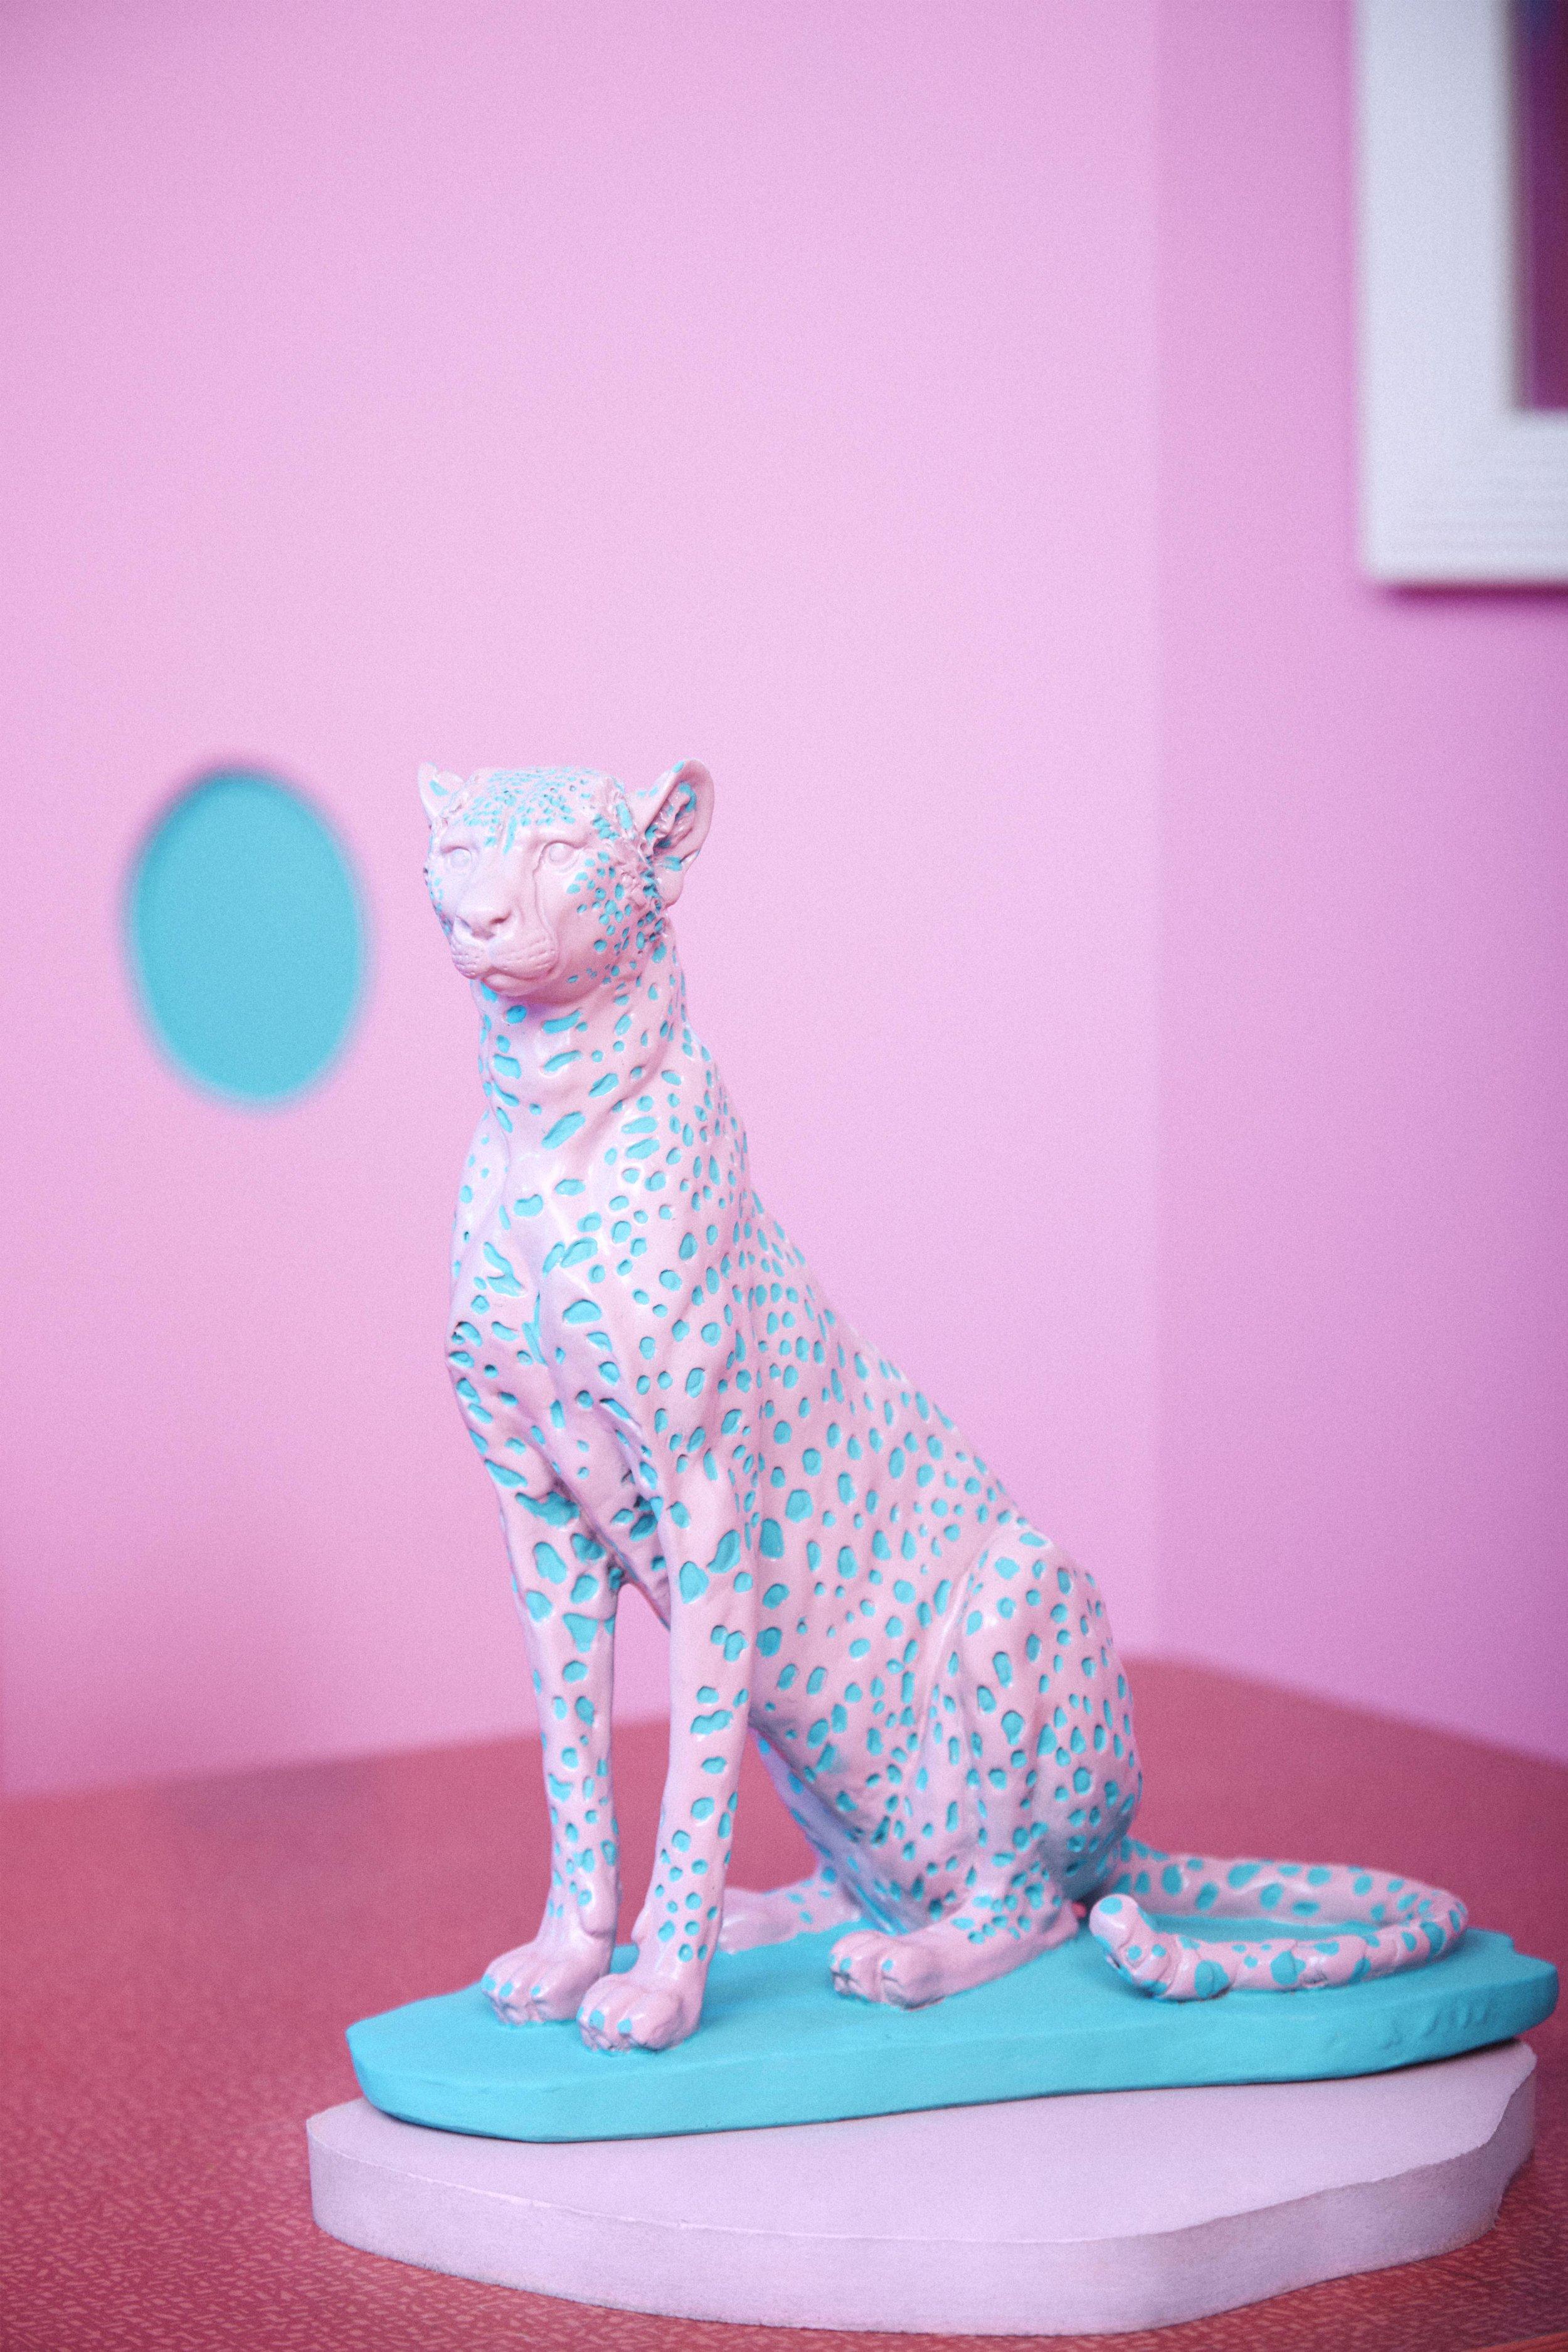 Kirsty Sorley by Yannick Lalardy